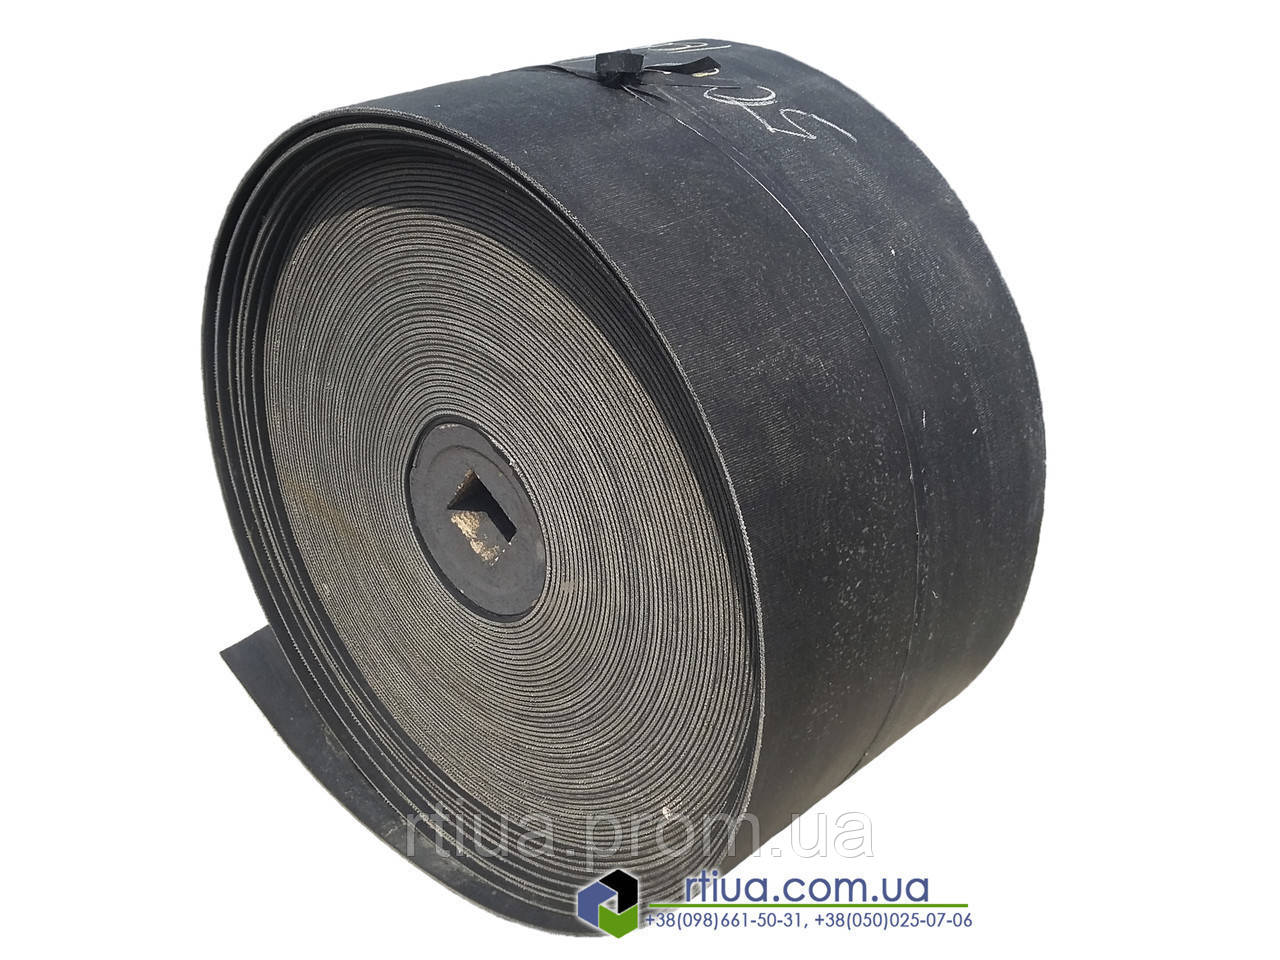 Конвейерная лента 200х8 мм